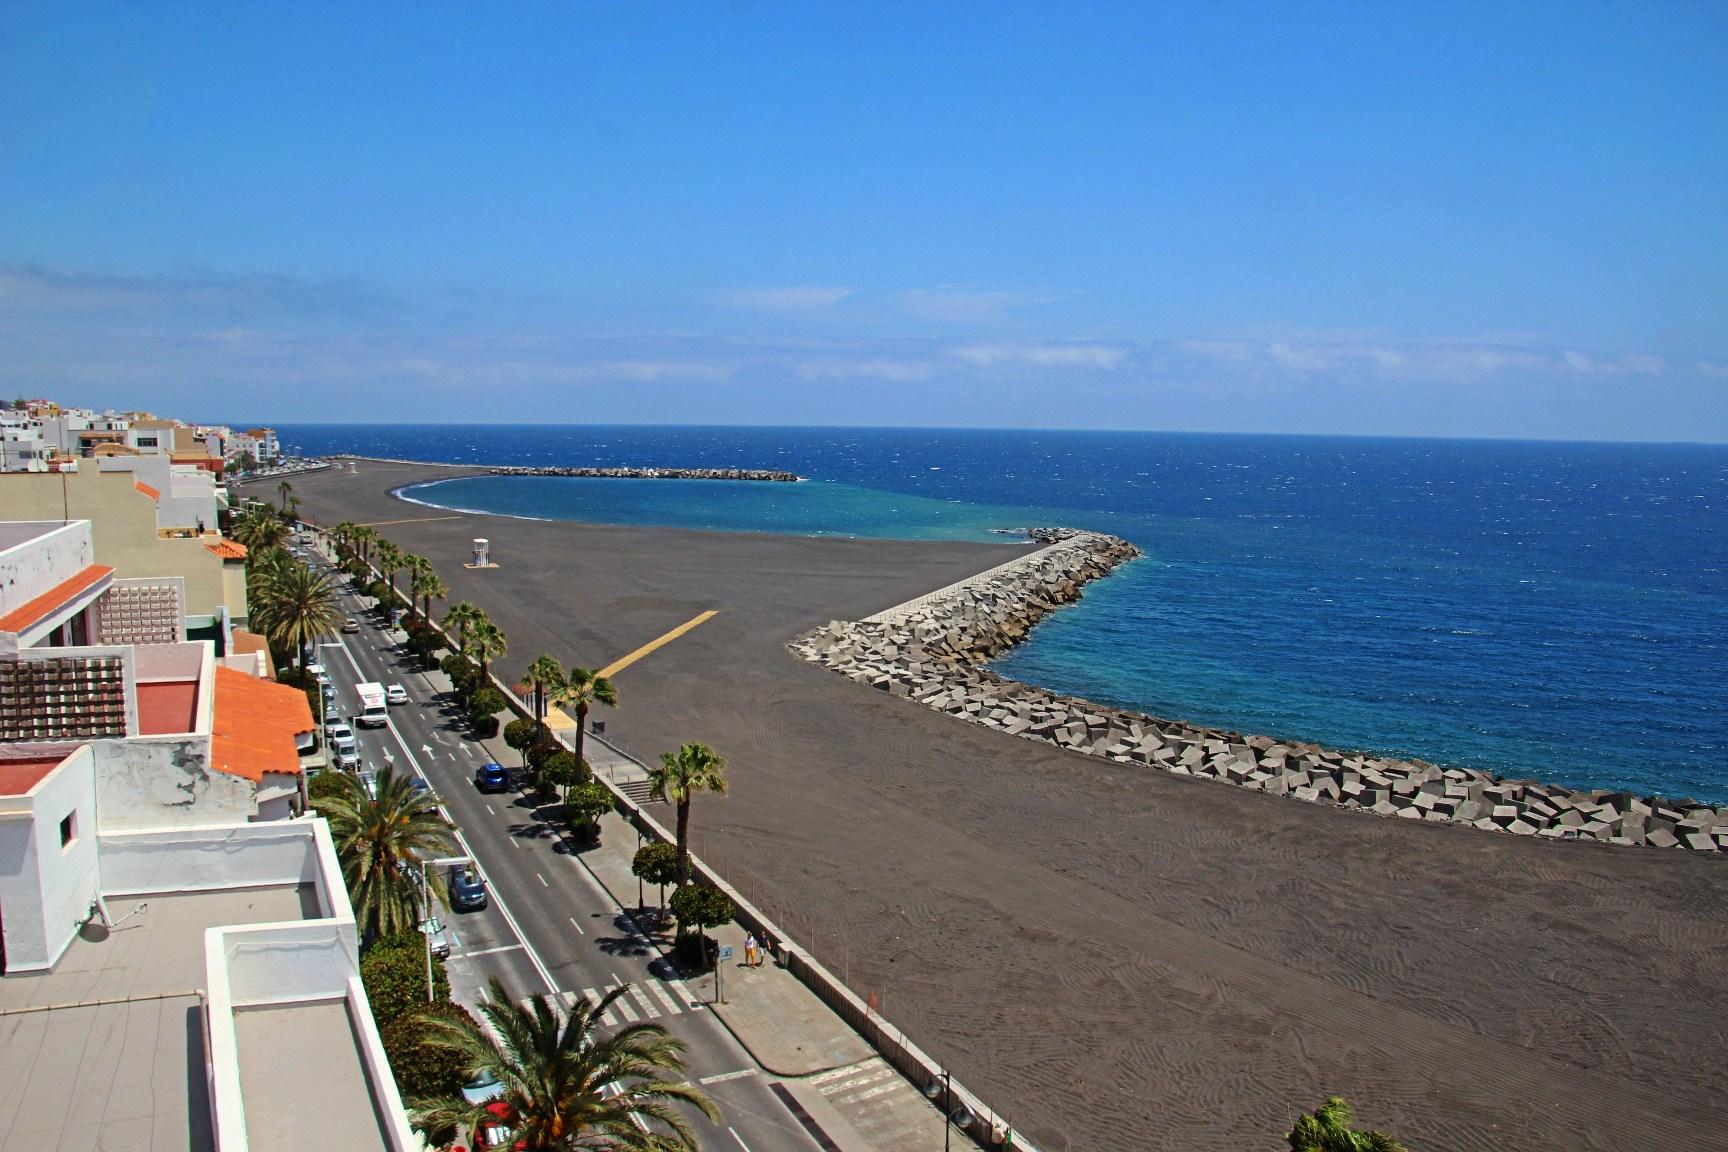 La nueva playa de Santa Cruz de La